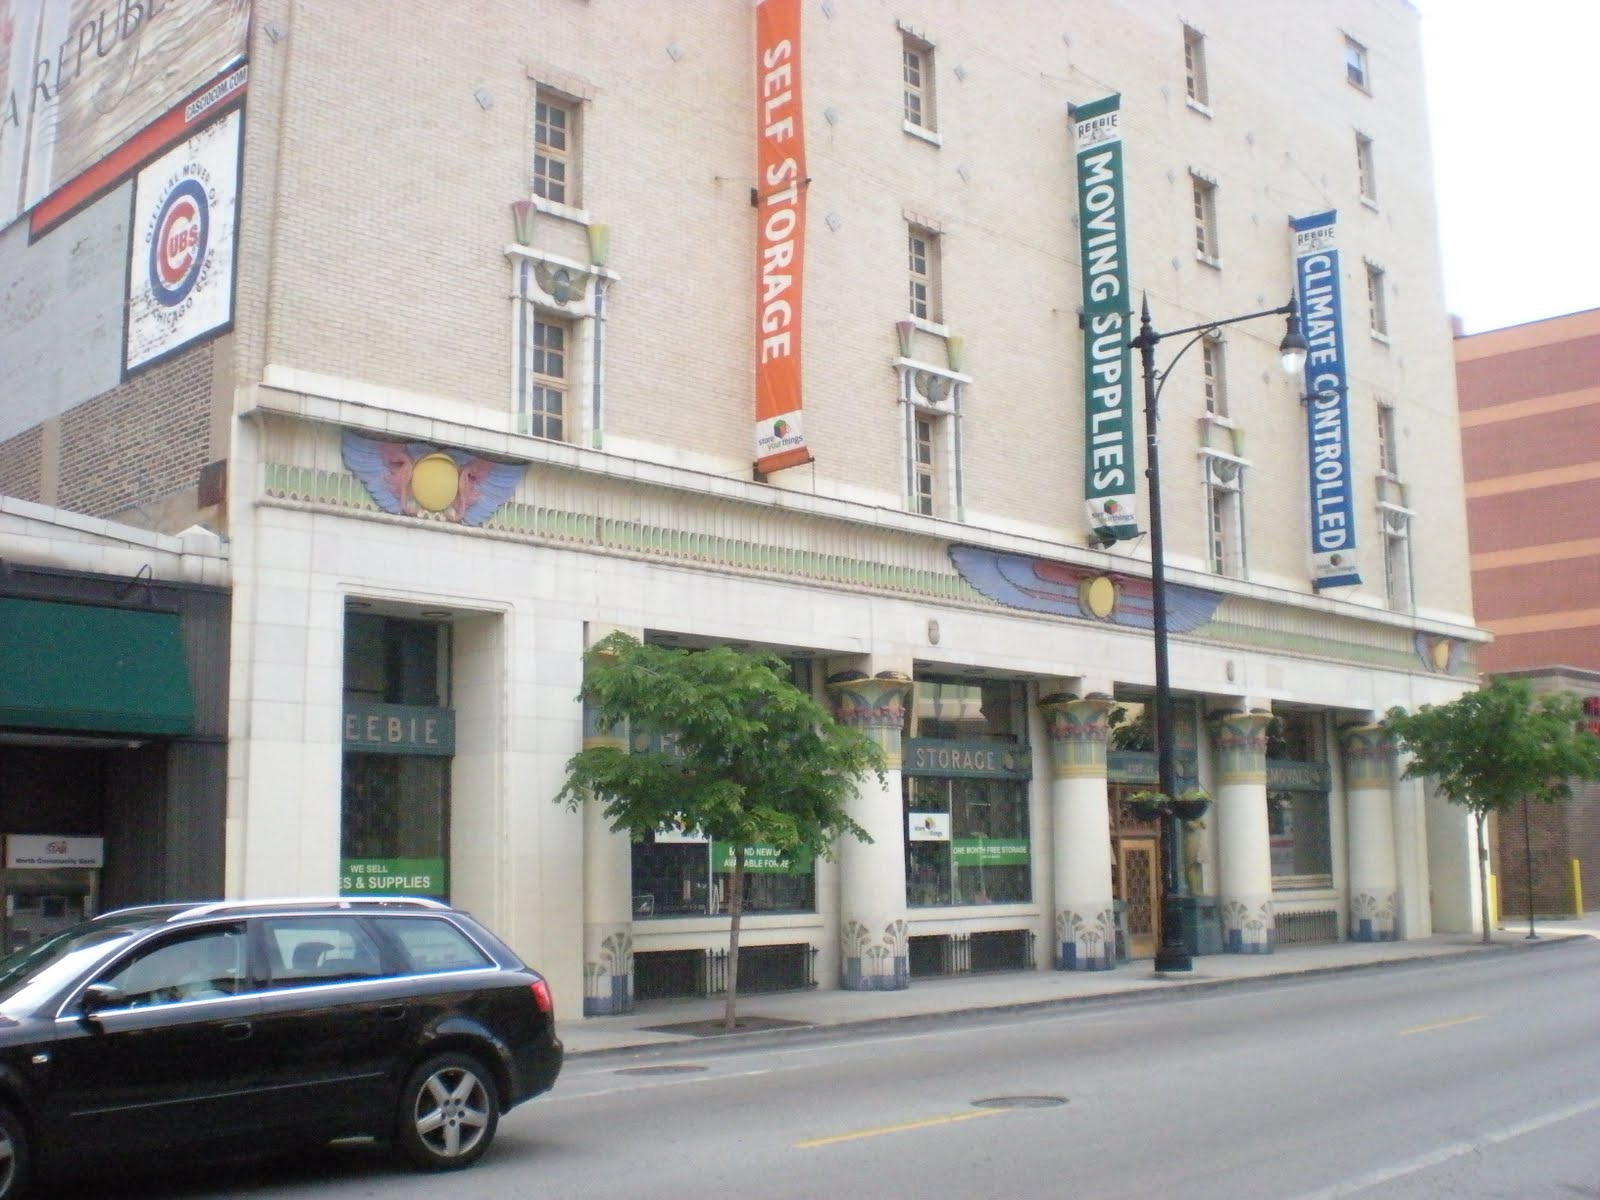 Chicago Landmarks Tour Trip Reebie Storage Warehouse